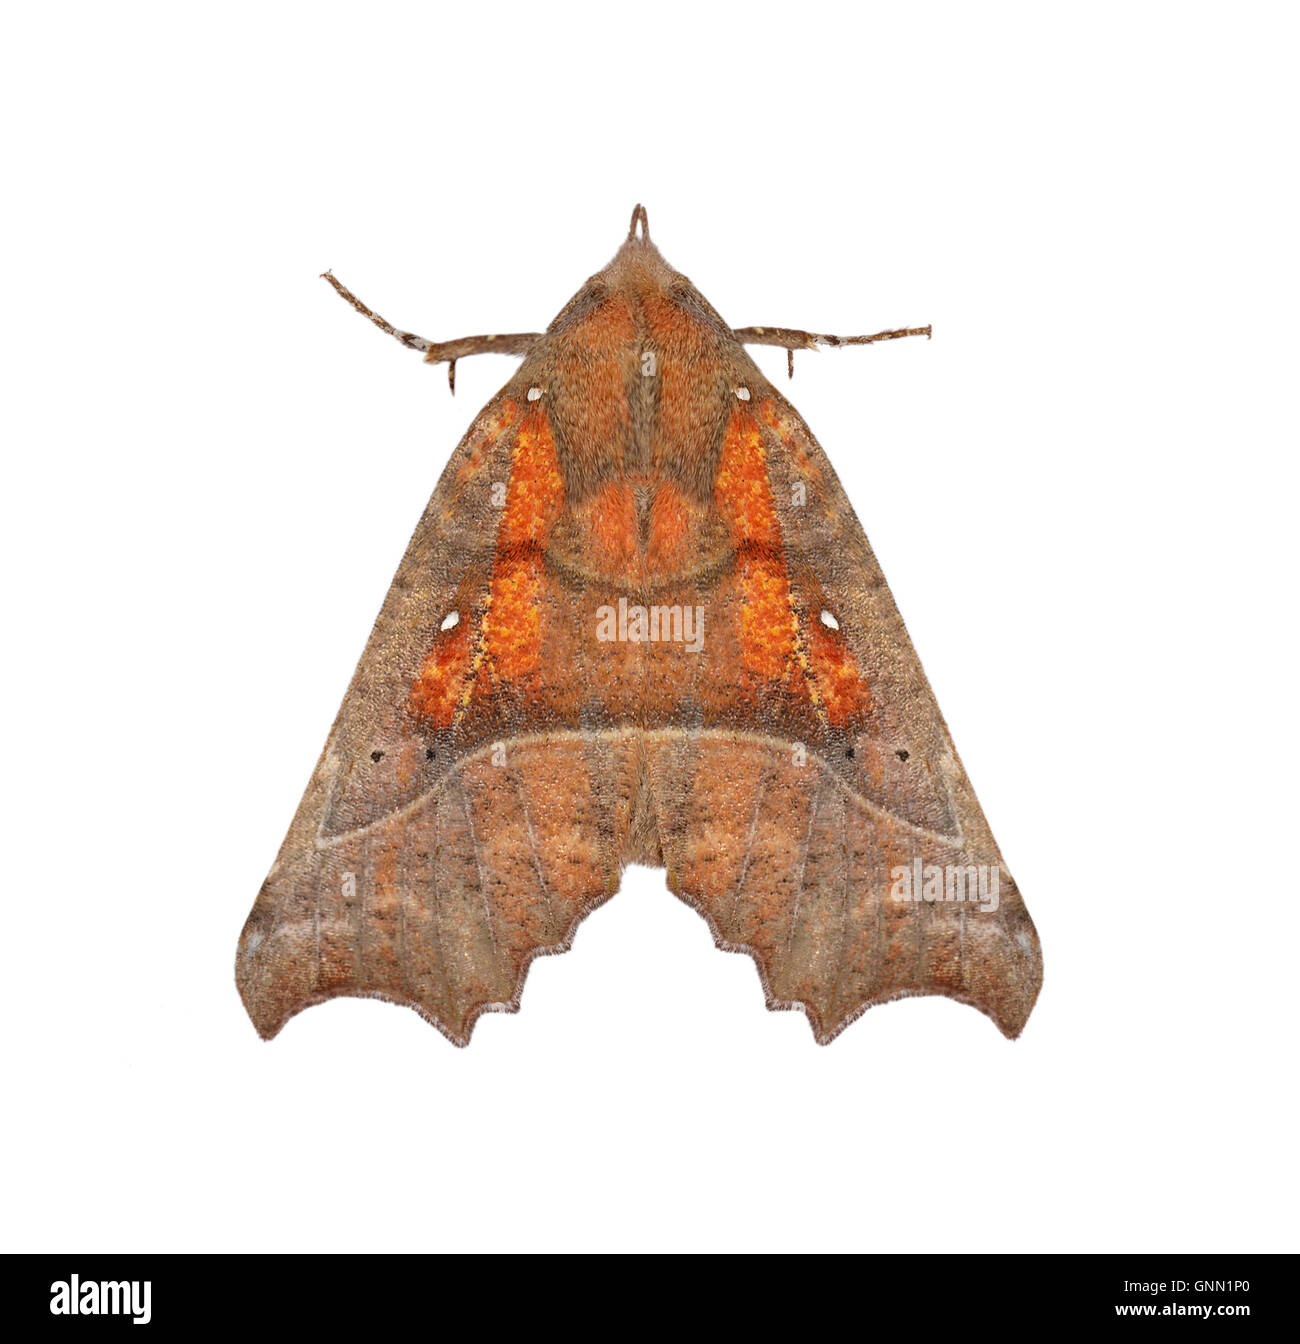 72.001 (2469) Scoliopteryx libatrix - Stock Image